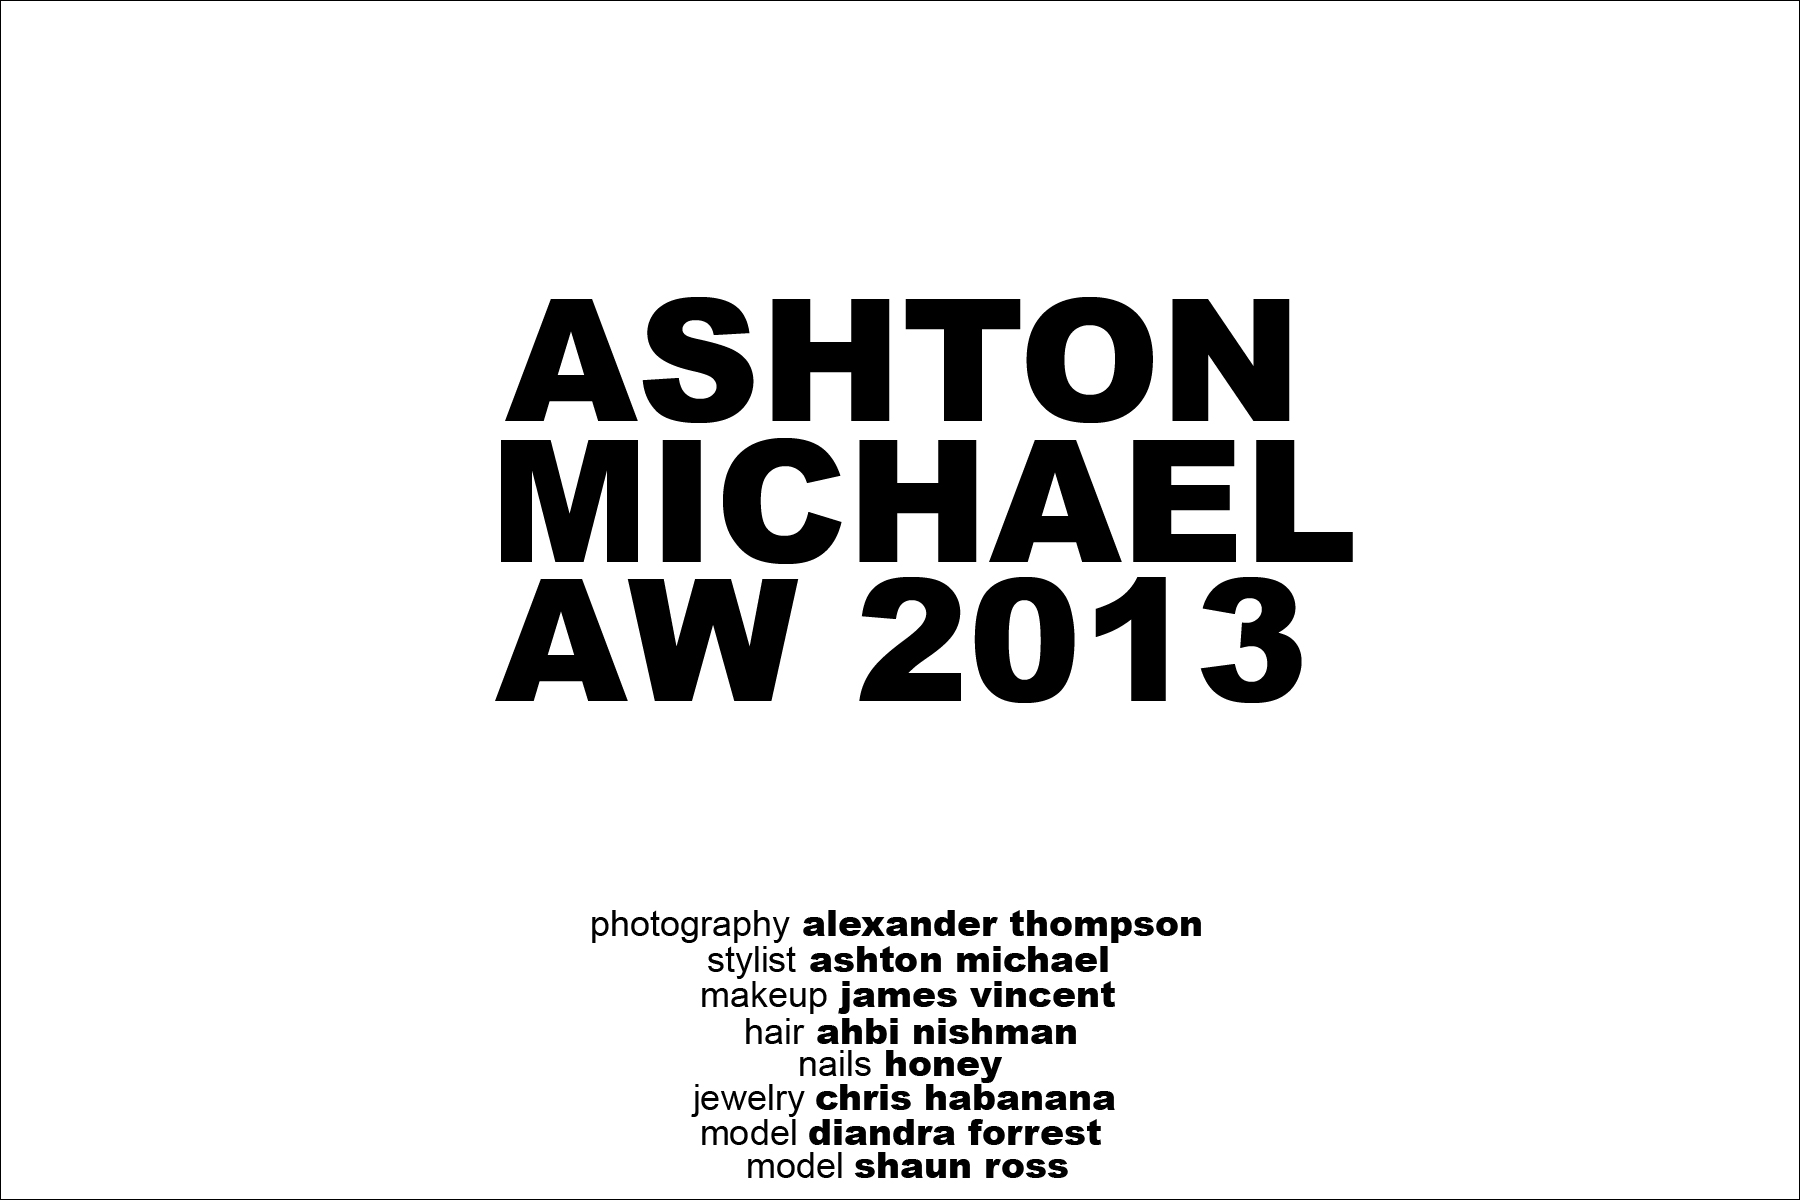 Credits for Ashton Michael AW 2013, photographed by Alexander Thompson for Ponyboy Magazine.